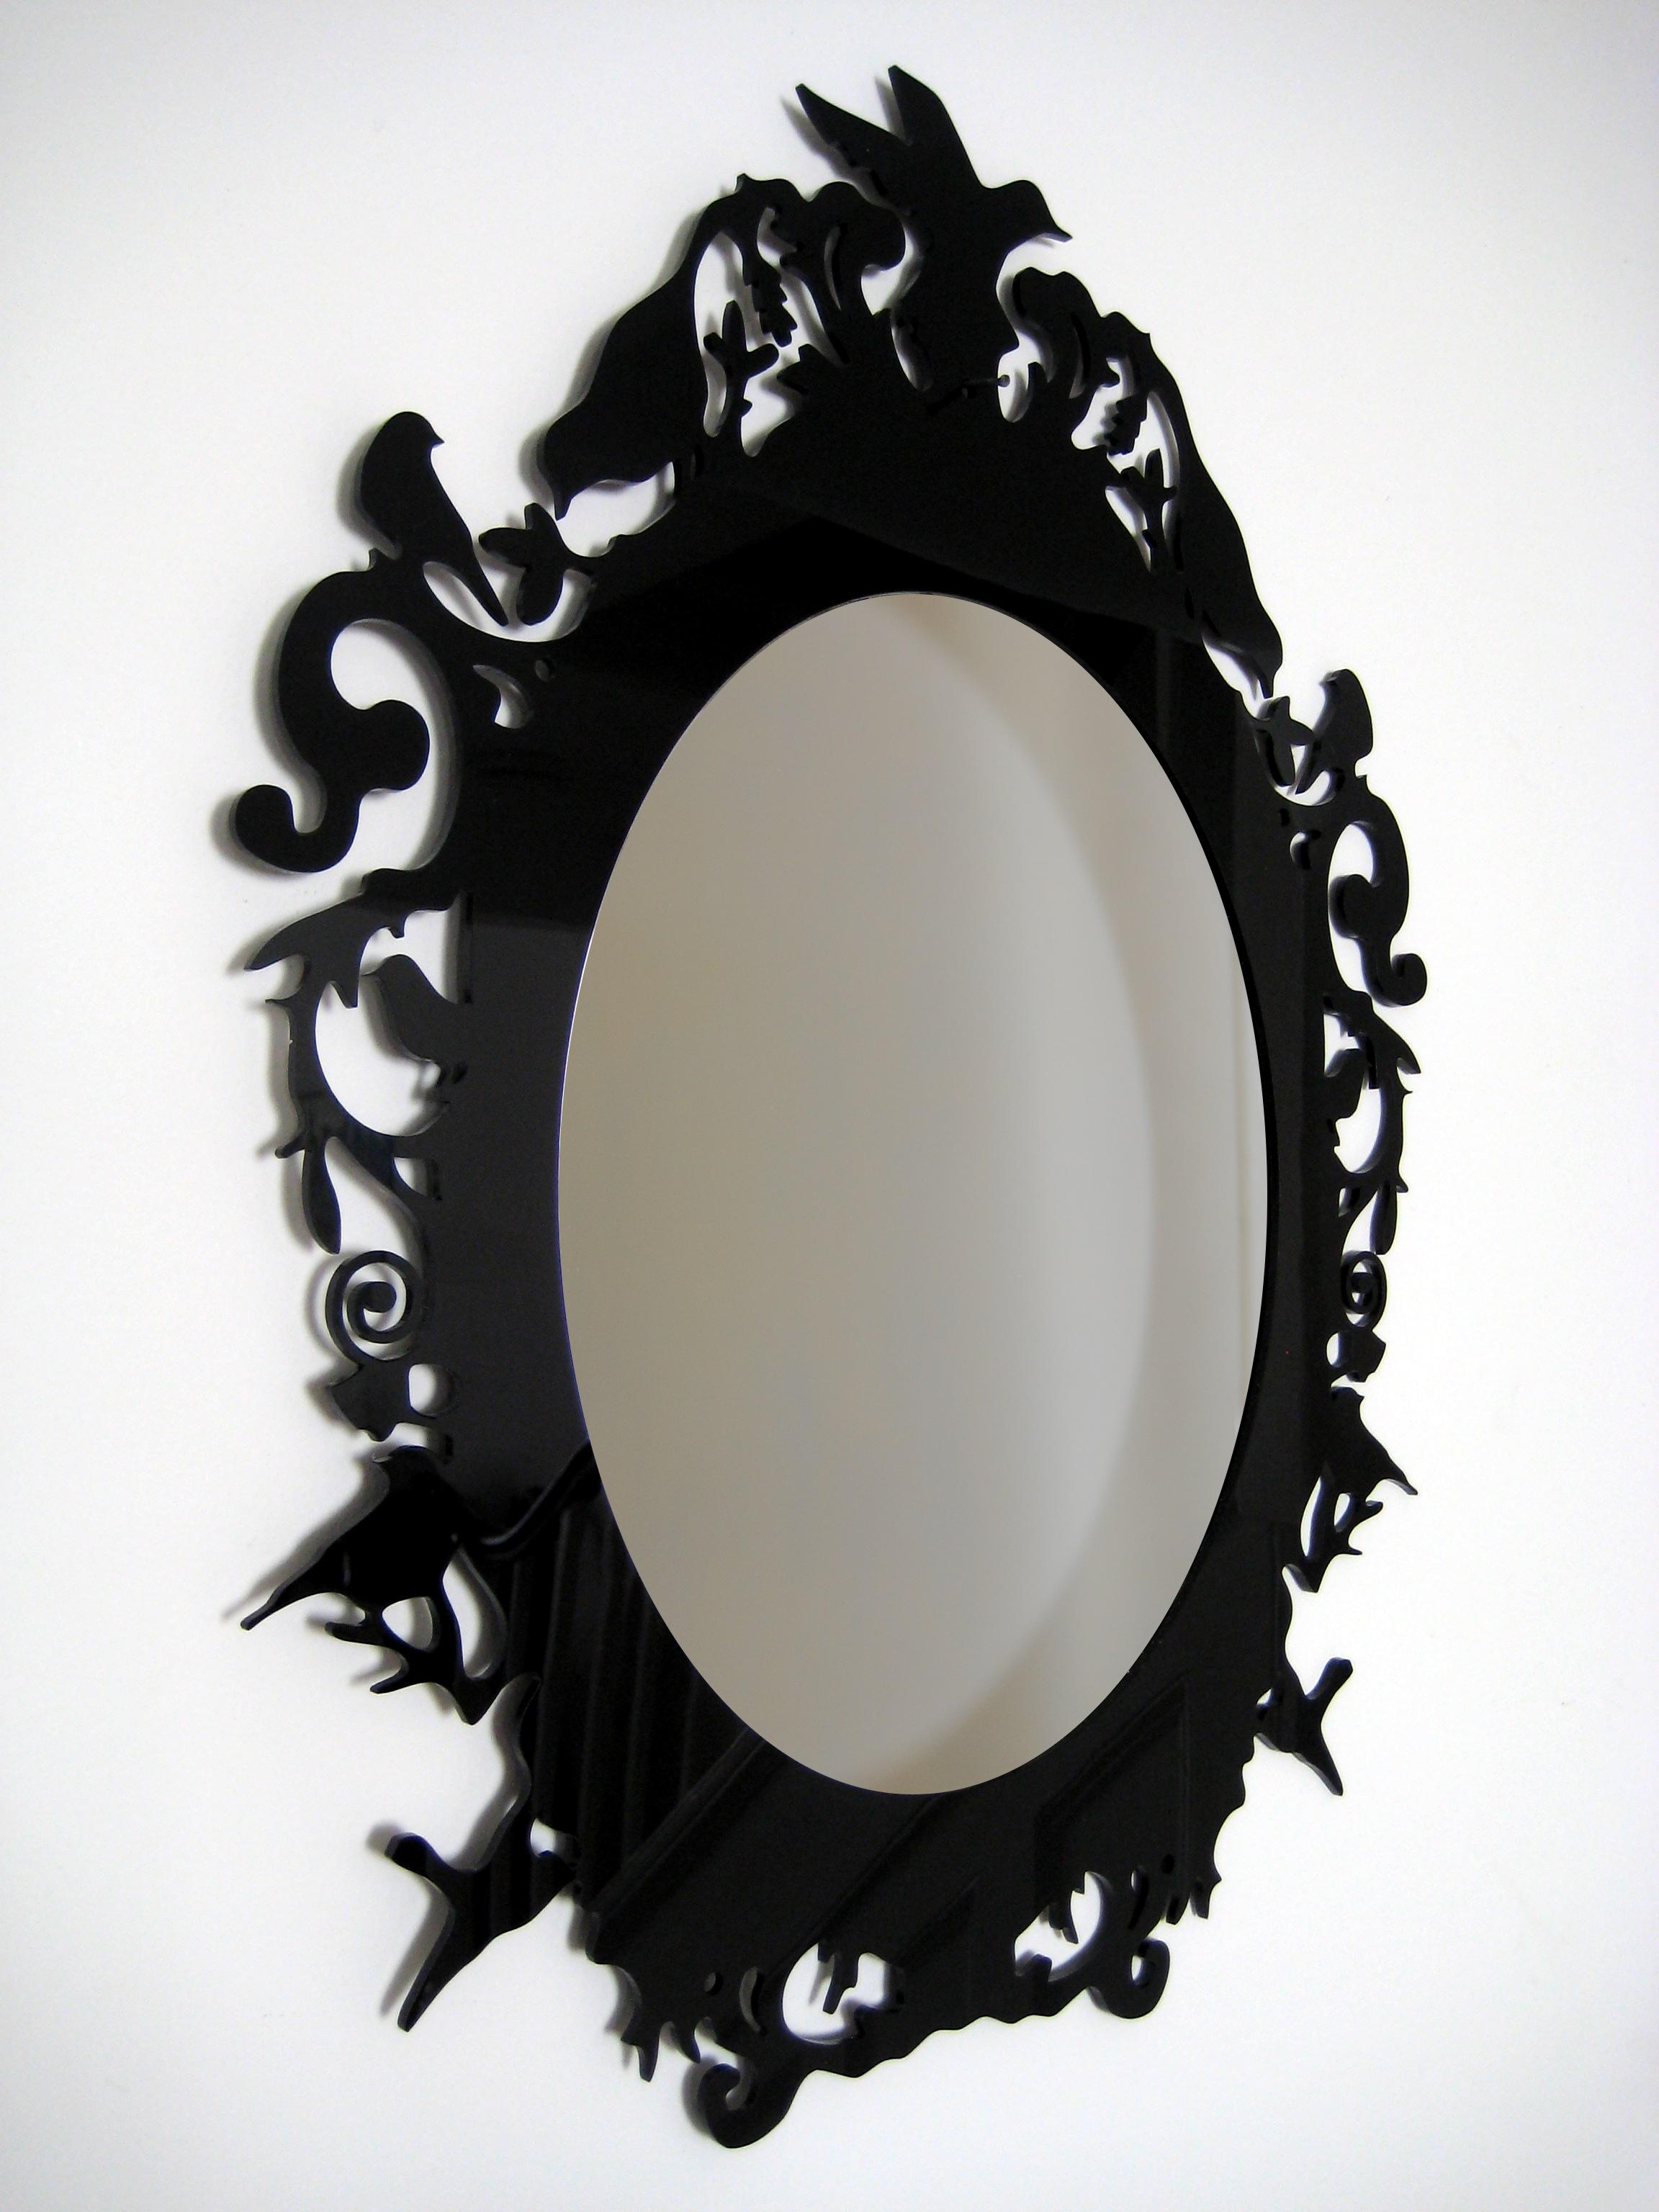 Examplary Laser Cut Acrylic Rococo Inspired Baroque Mirror Acrylic Mirrors Frames Paisley Fox How To Cut A Mirror Glaze Cake How To Cut A Mirror Into A Shape houzz-03 How To Cut A Mirror